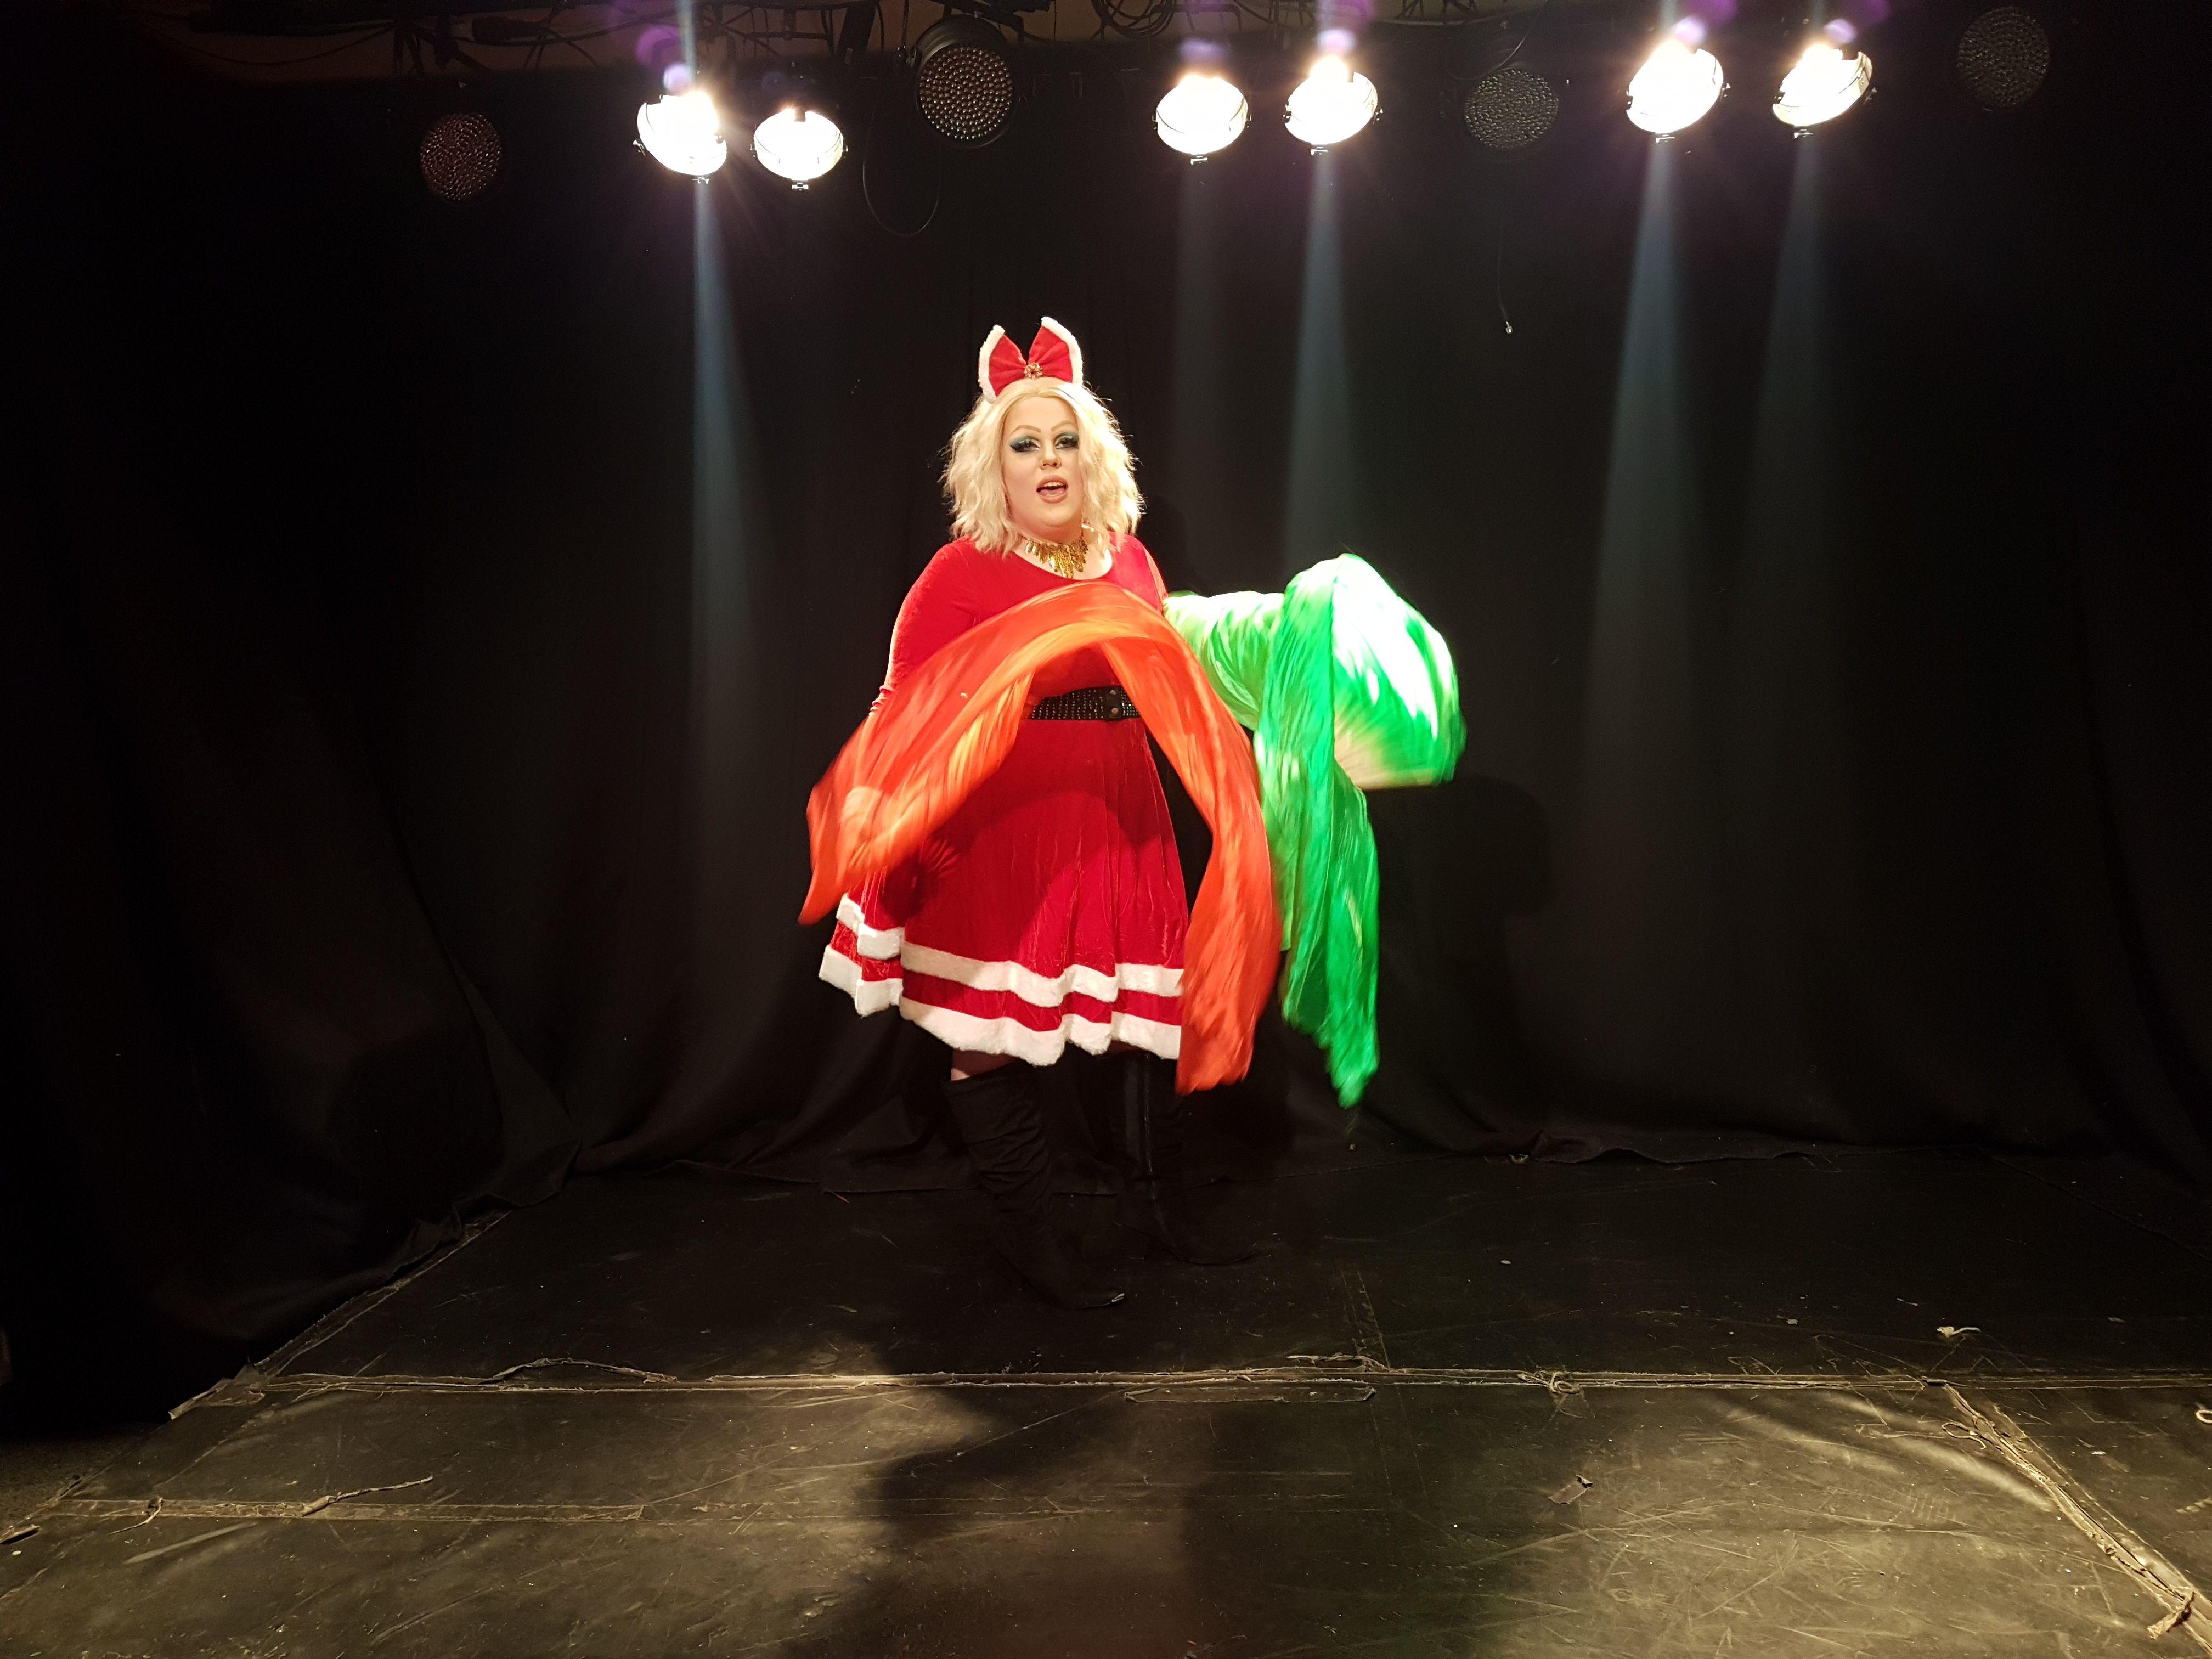 Dragartisten Jaran som Monetta, i rød kjole og med blond parykk (Foto: Ung.no)